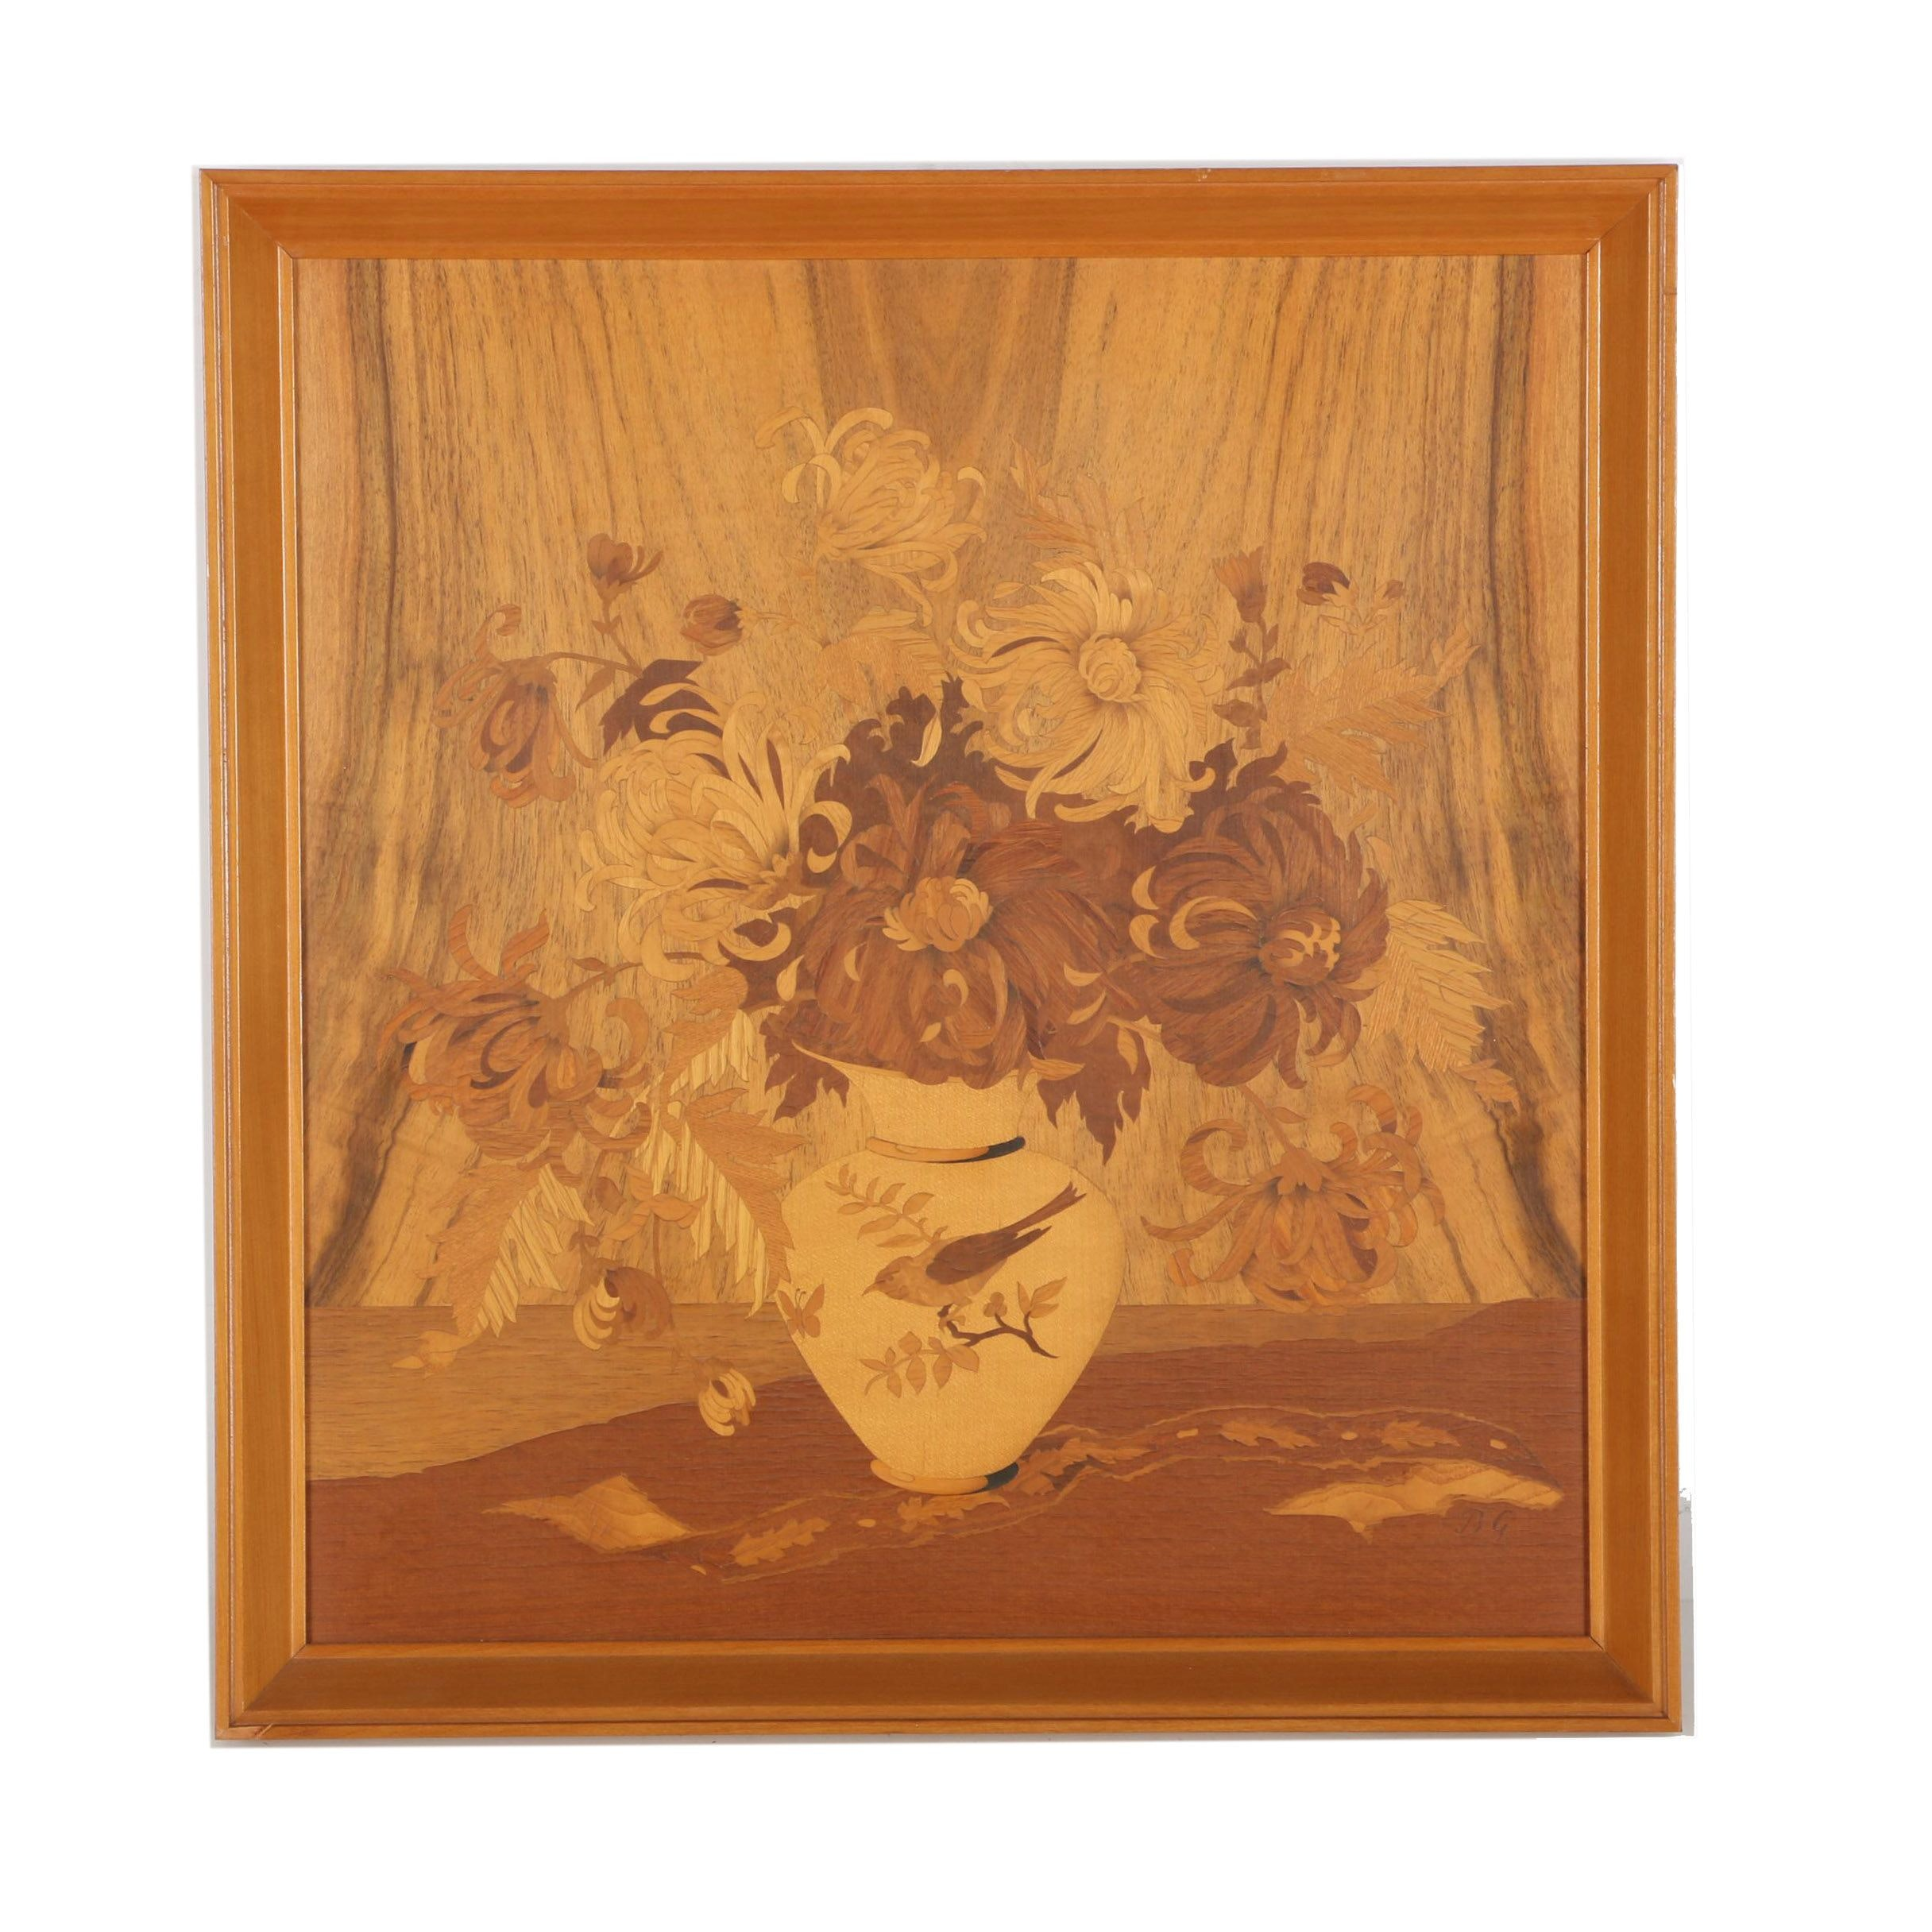 Buchschmid Gretaux Framed Marquetry Plaque Circa 1950